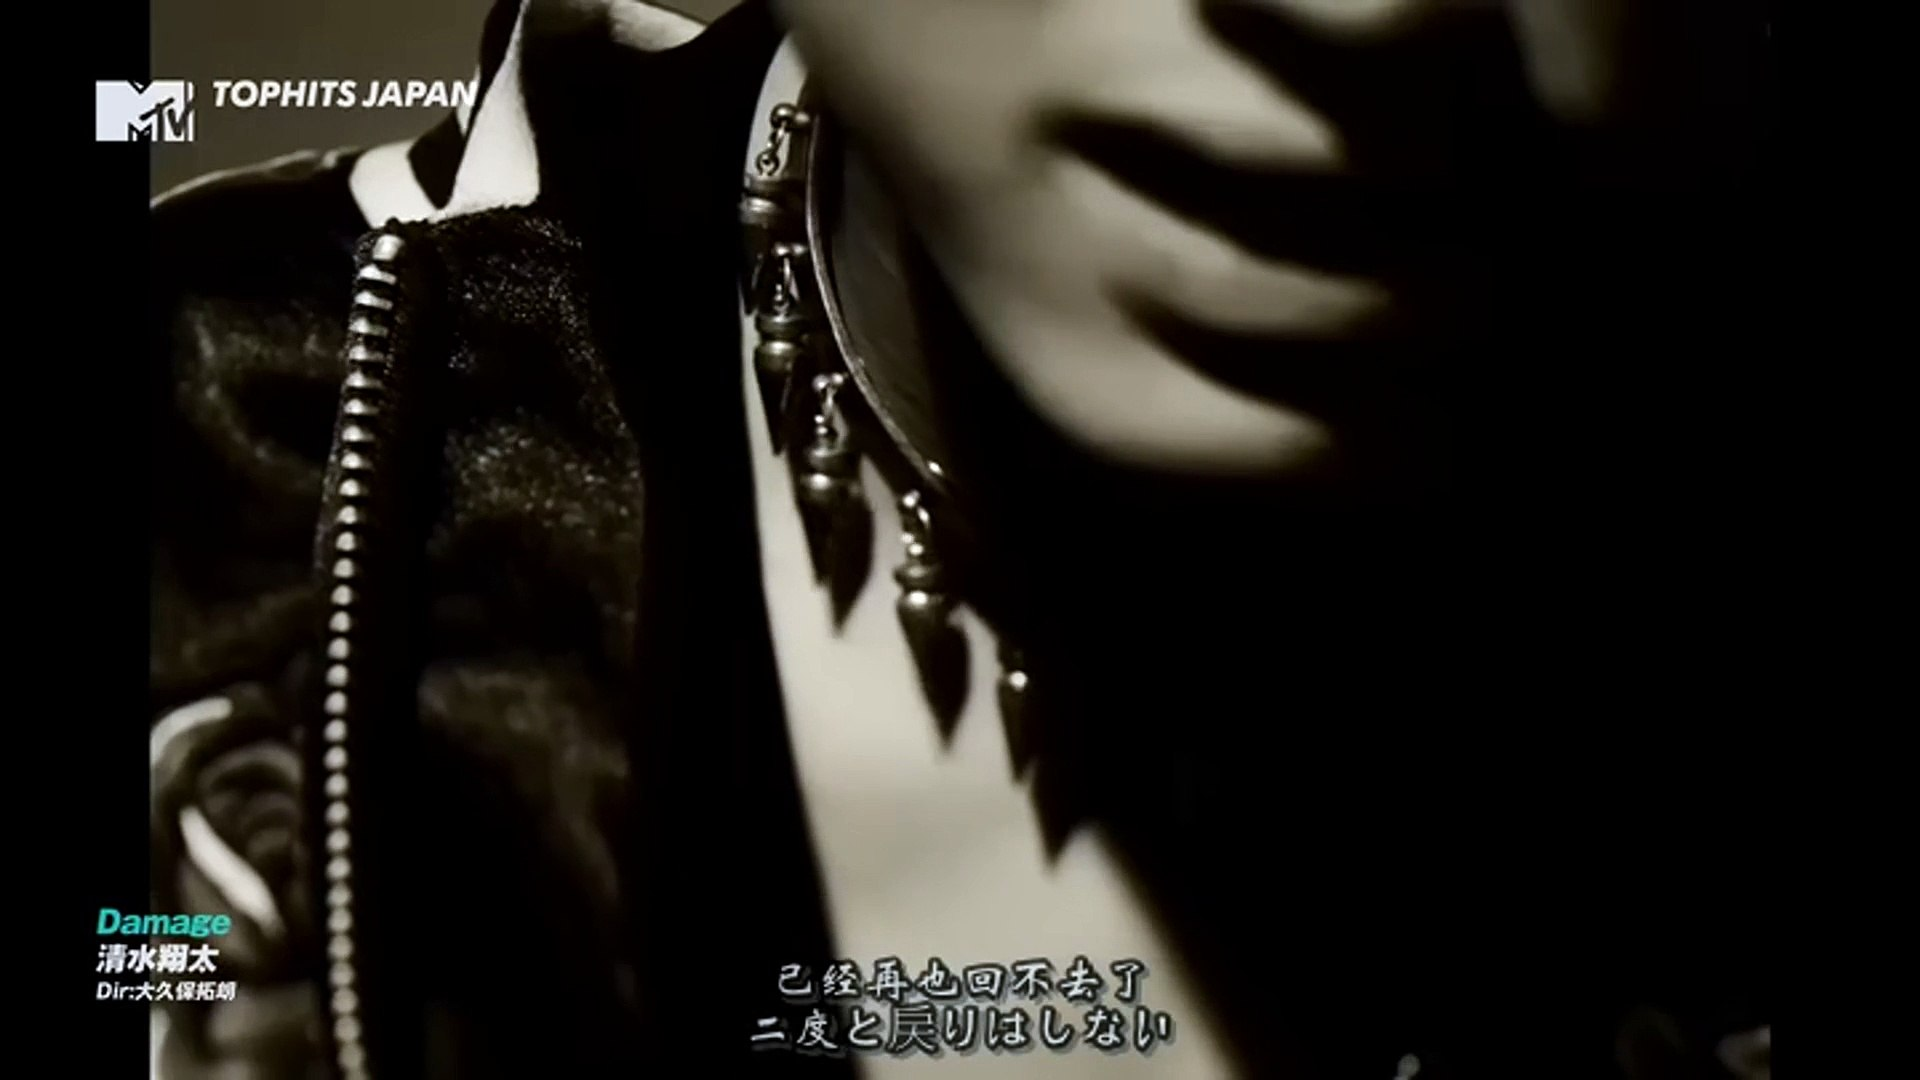 清水翔太 Damage 中日字幕by Lucia 影片dailymotion